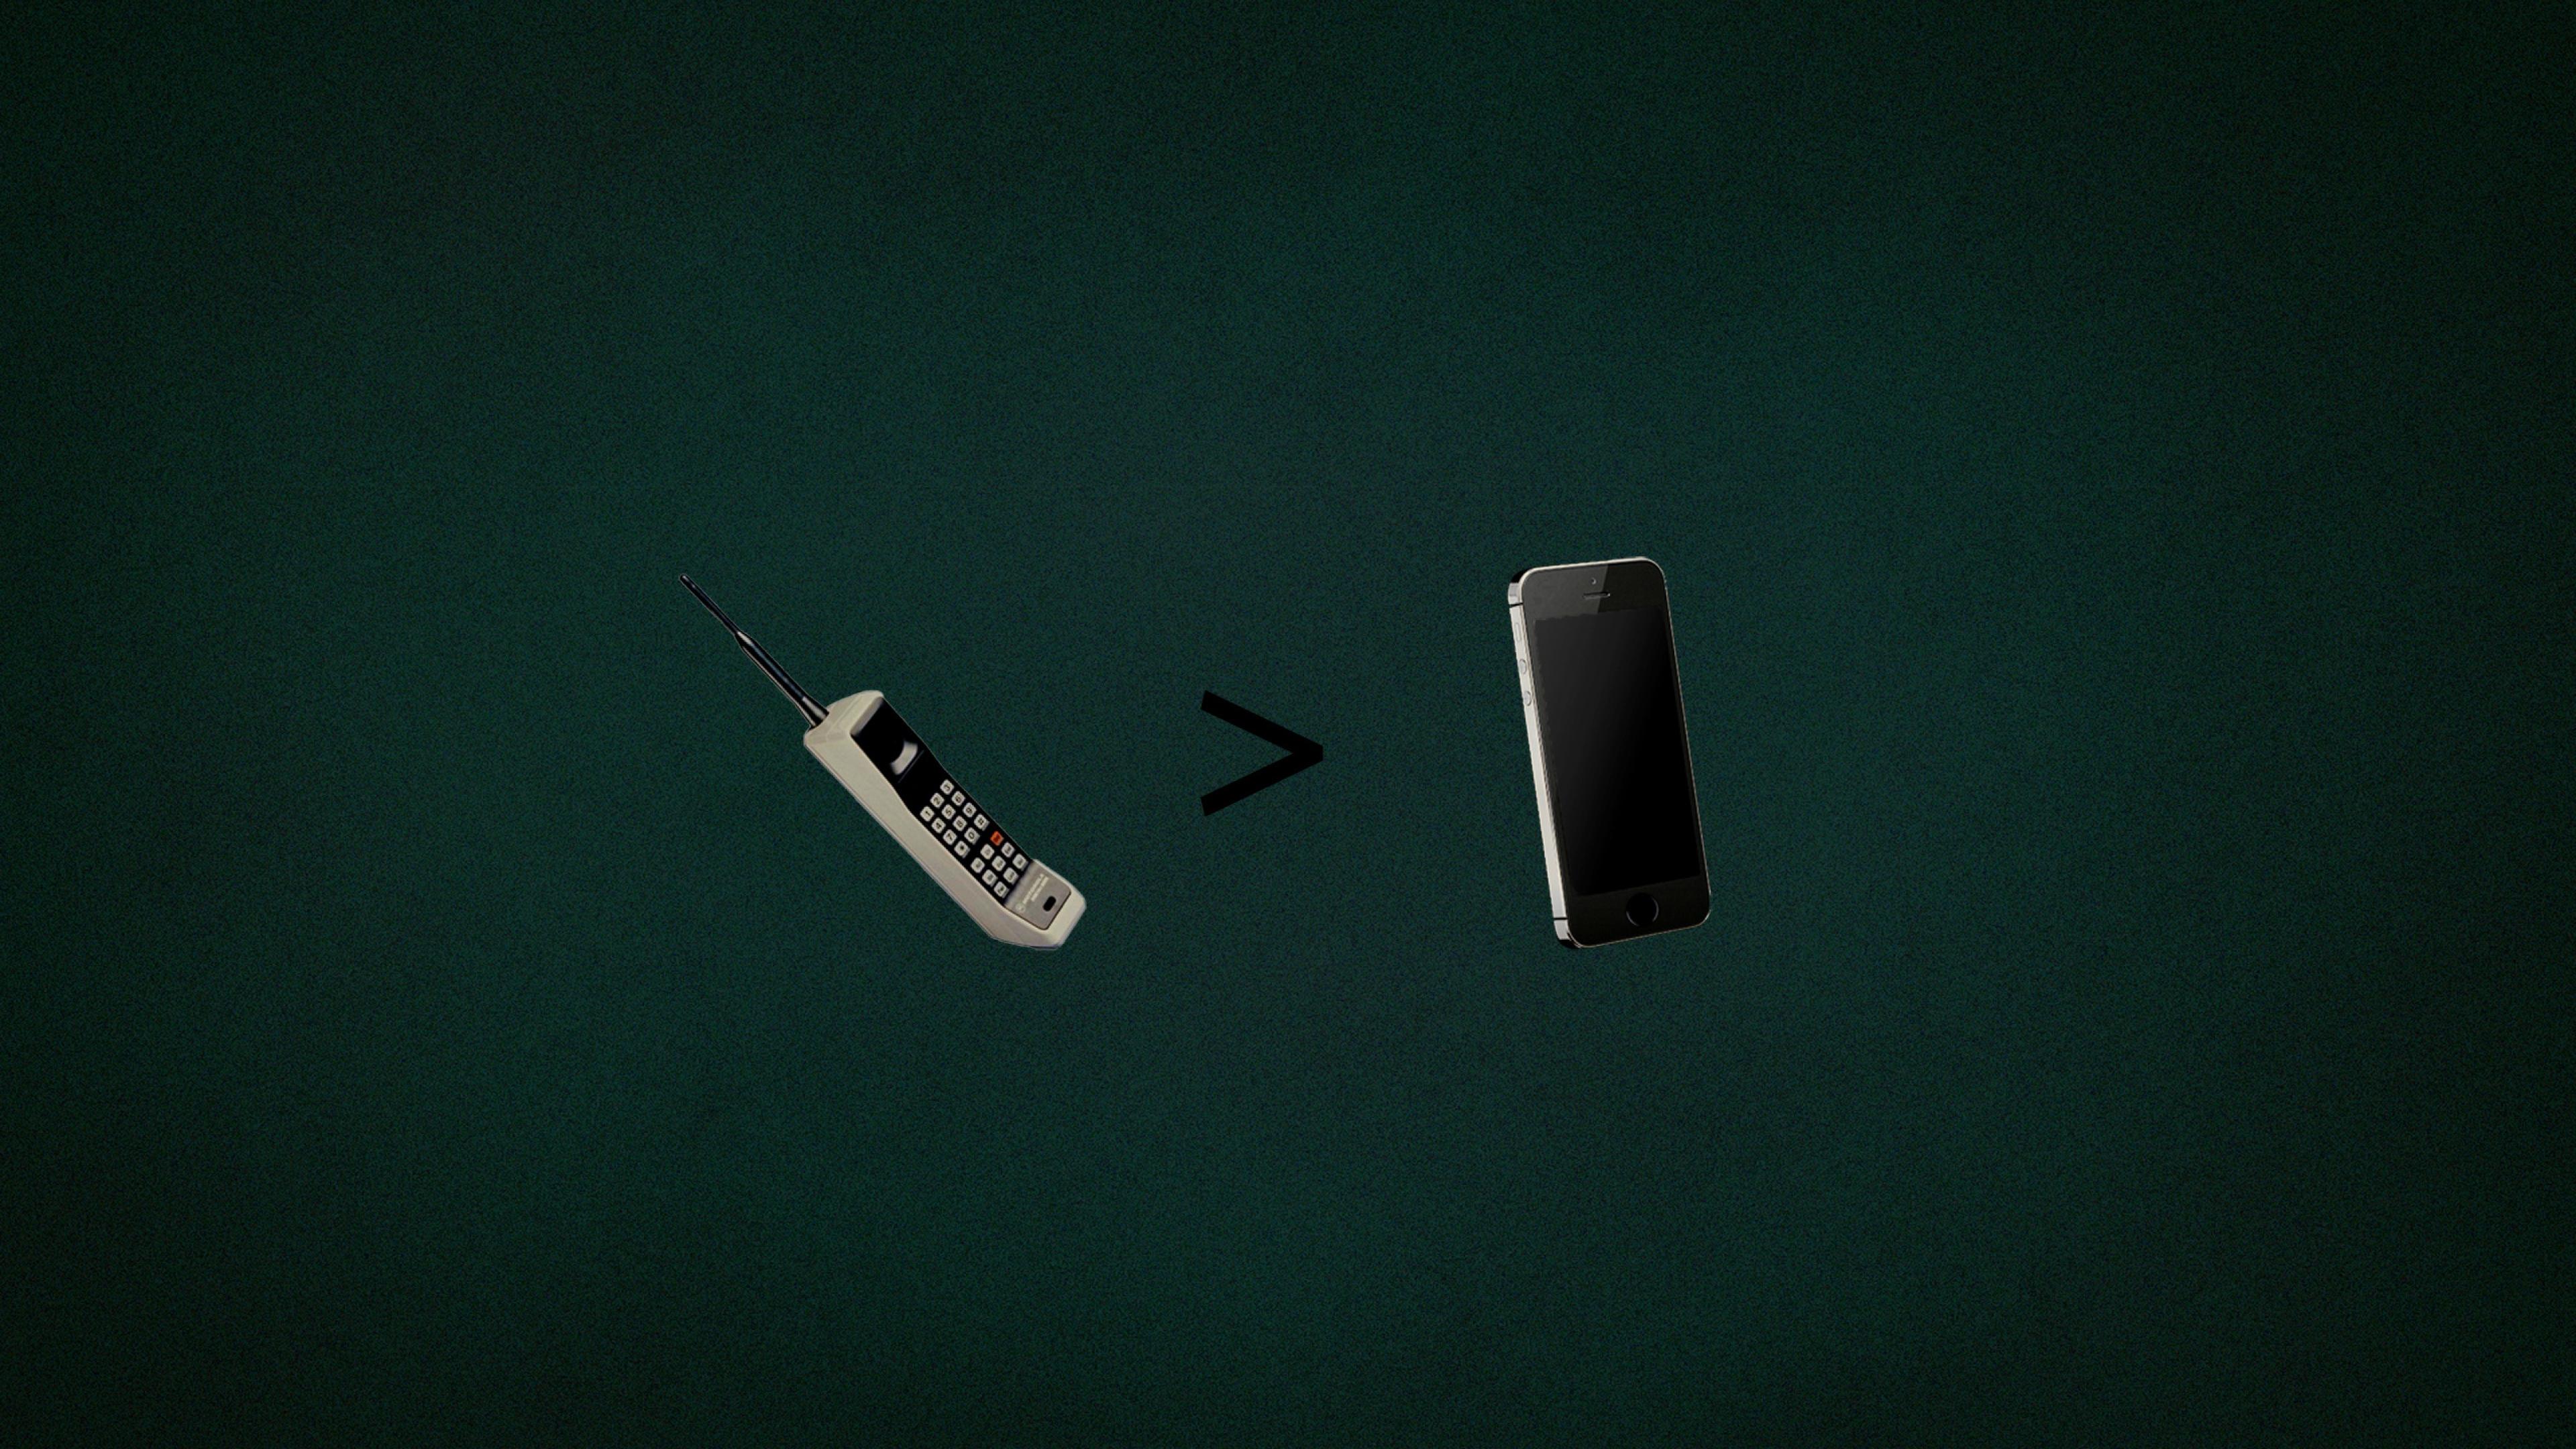 Iphone 5s Wallpapers Hd: Evolve 4K Wallpaper